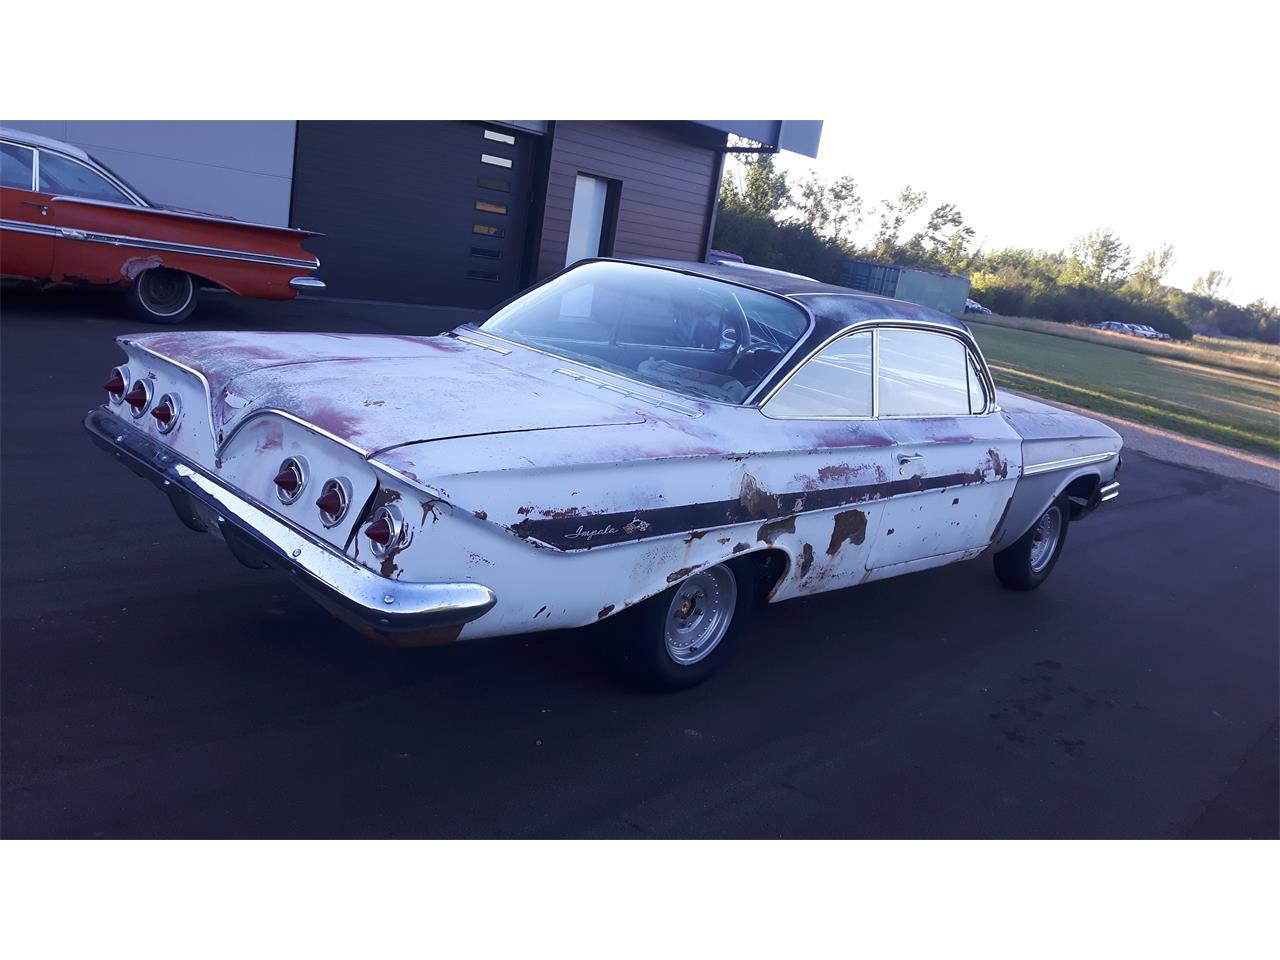 1961 Chevrolet Impala (CC-1272974) for sale in saskatoon, Saskatchewan